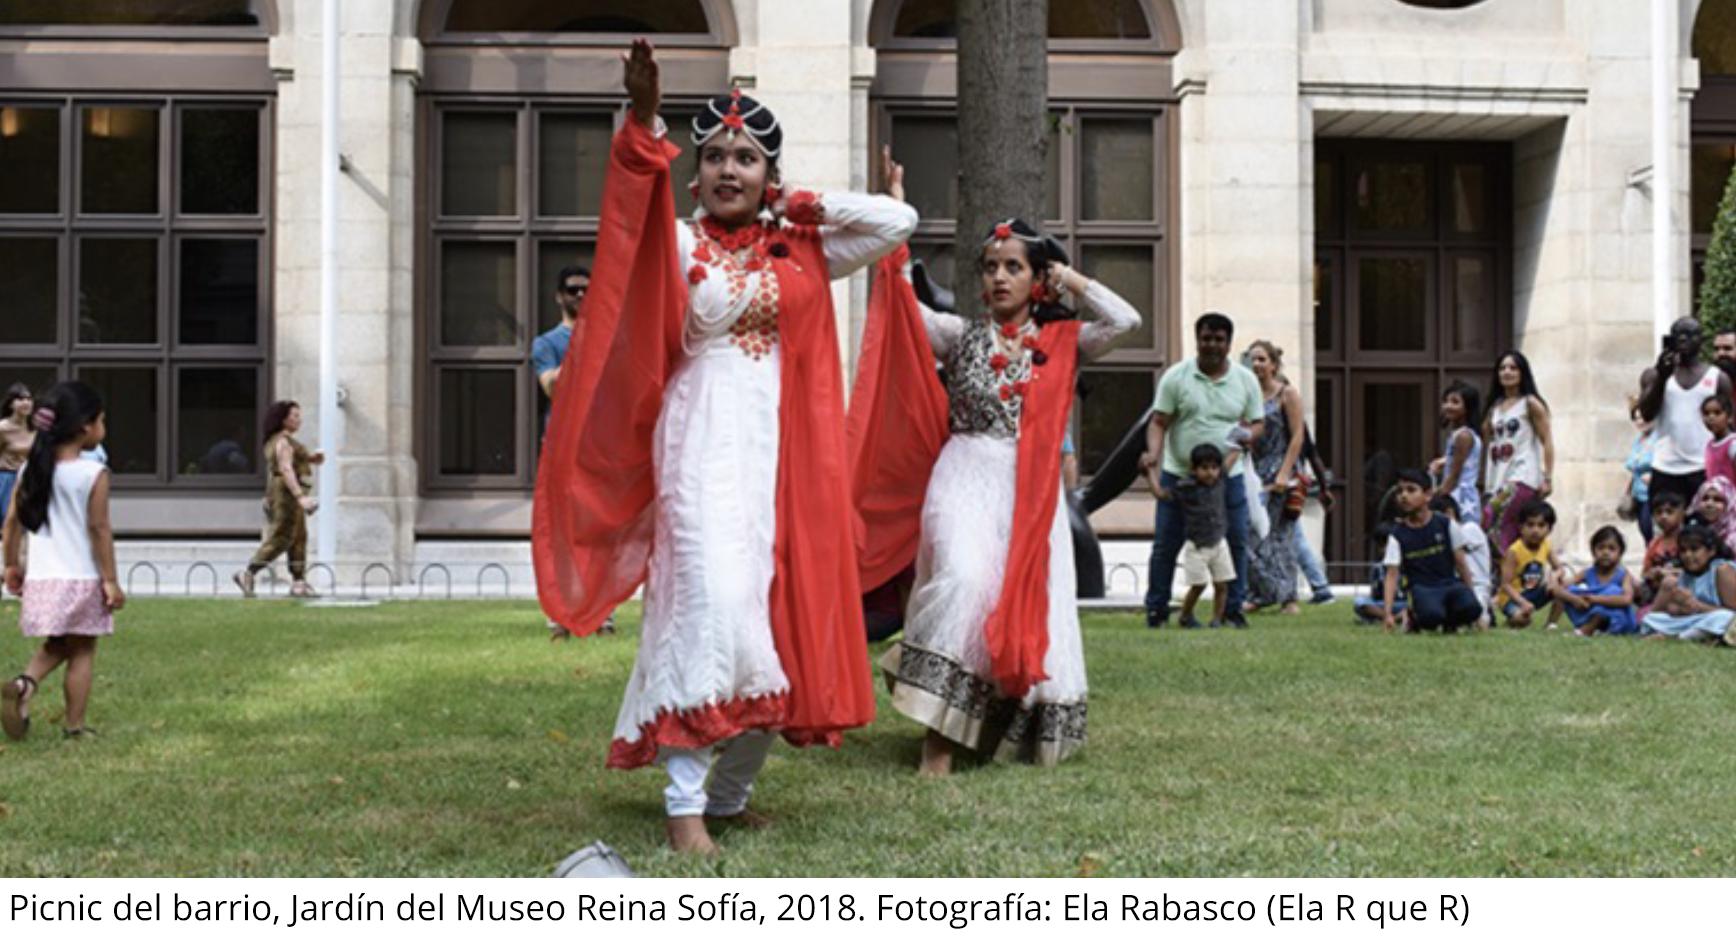 El gran regalo de la diversidad cultural